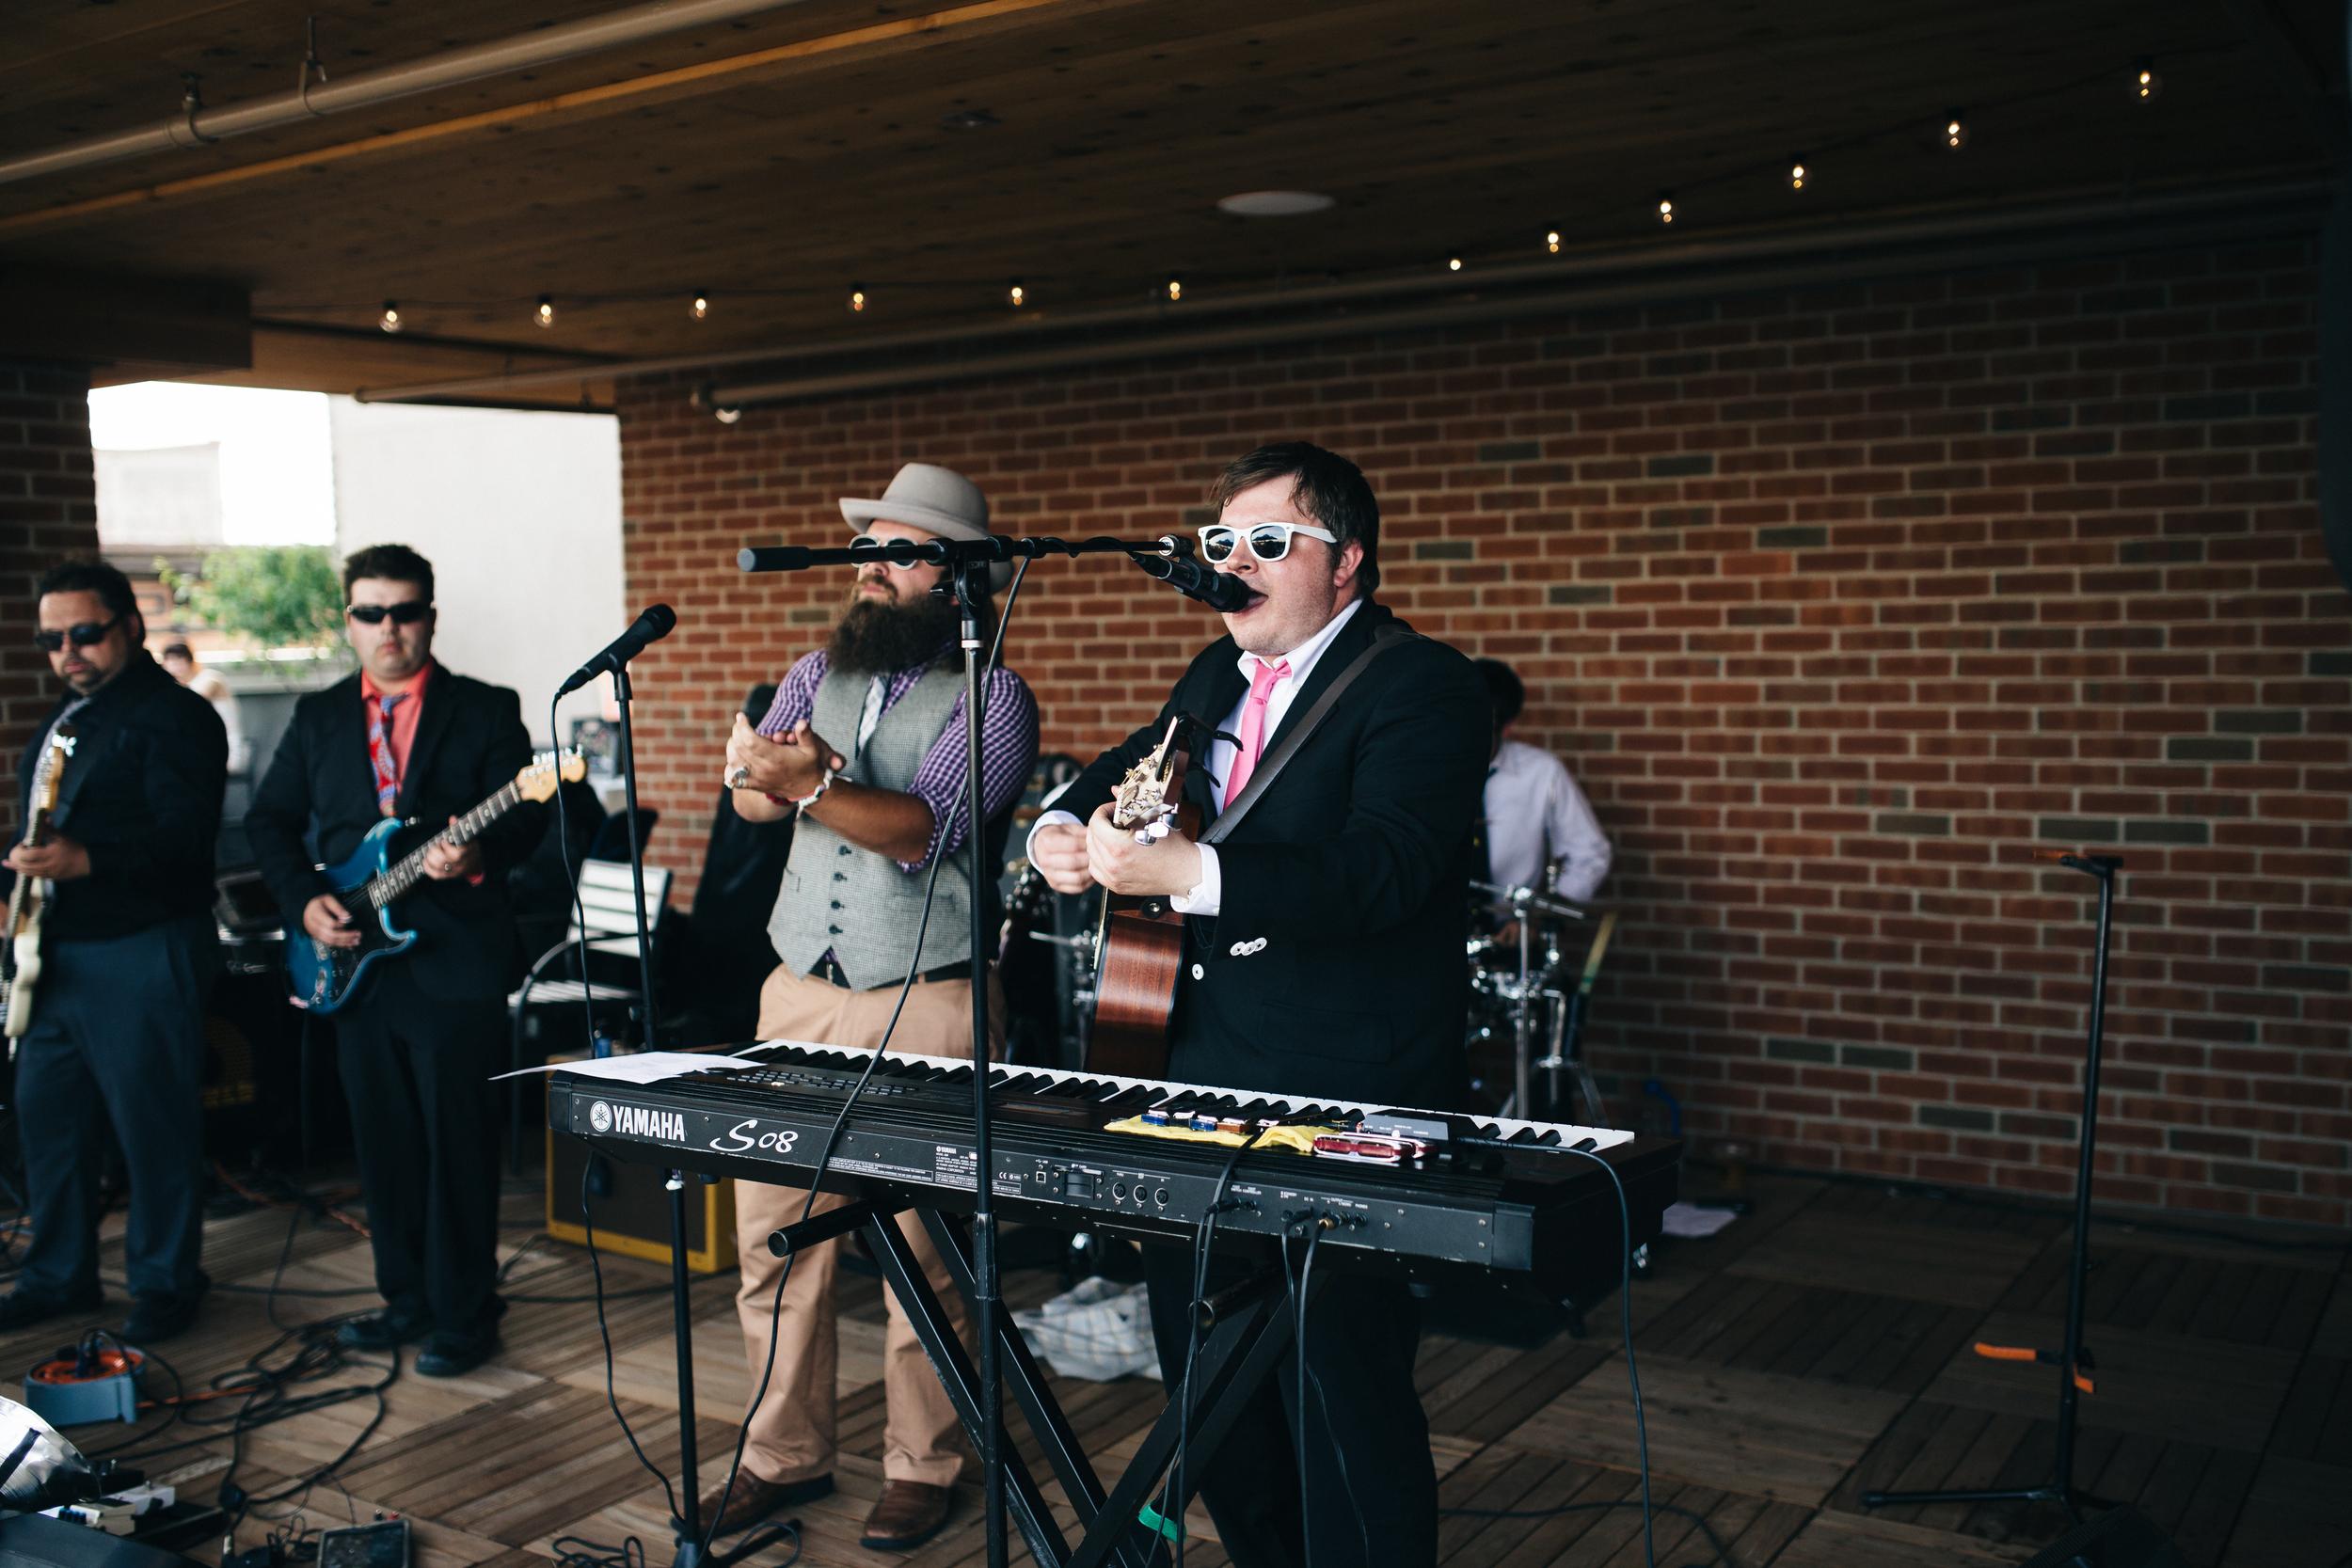 Toledo wedding band, Nine LIves, plays at Hensville wedding reception.